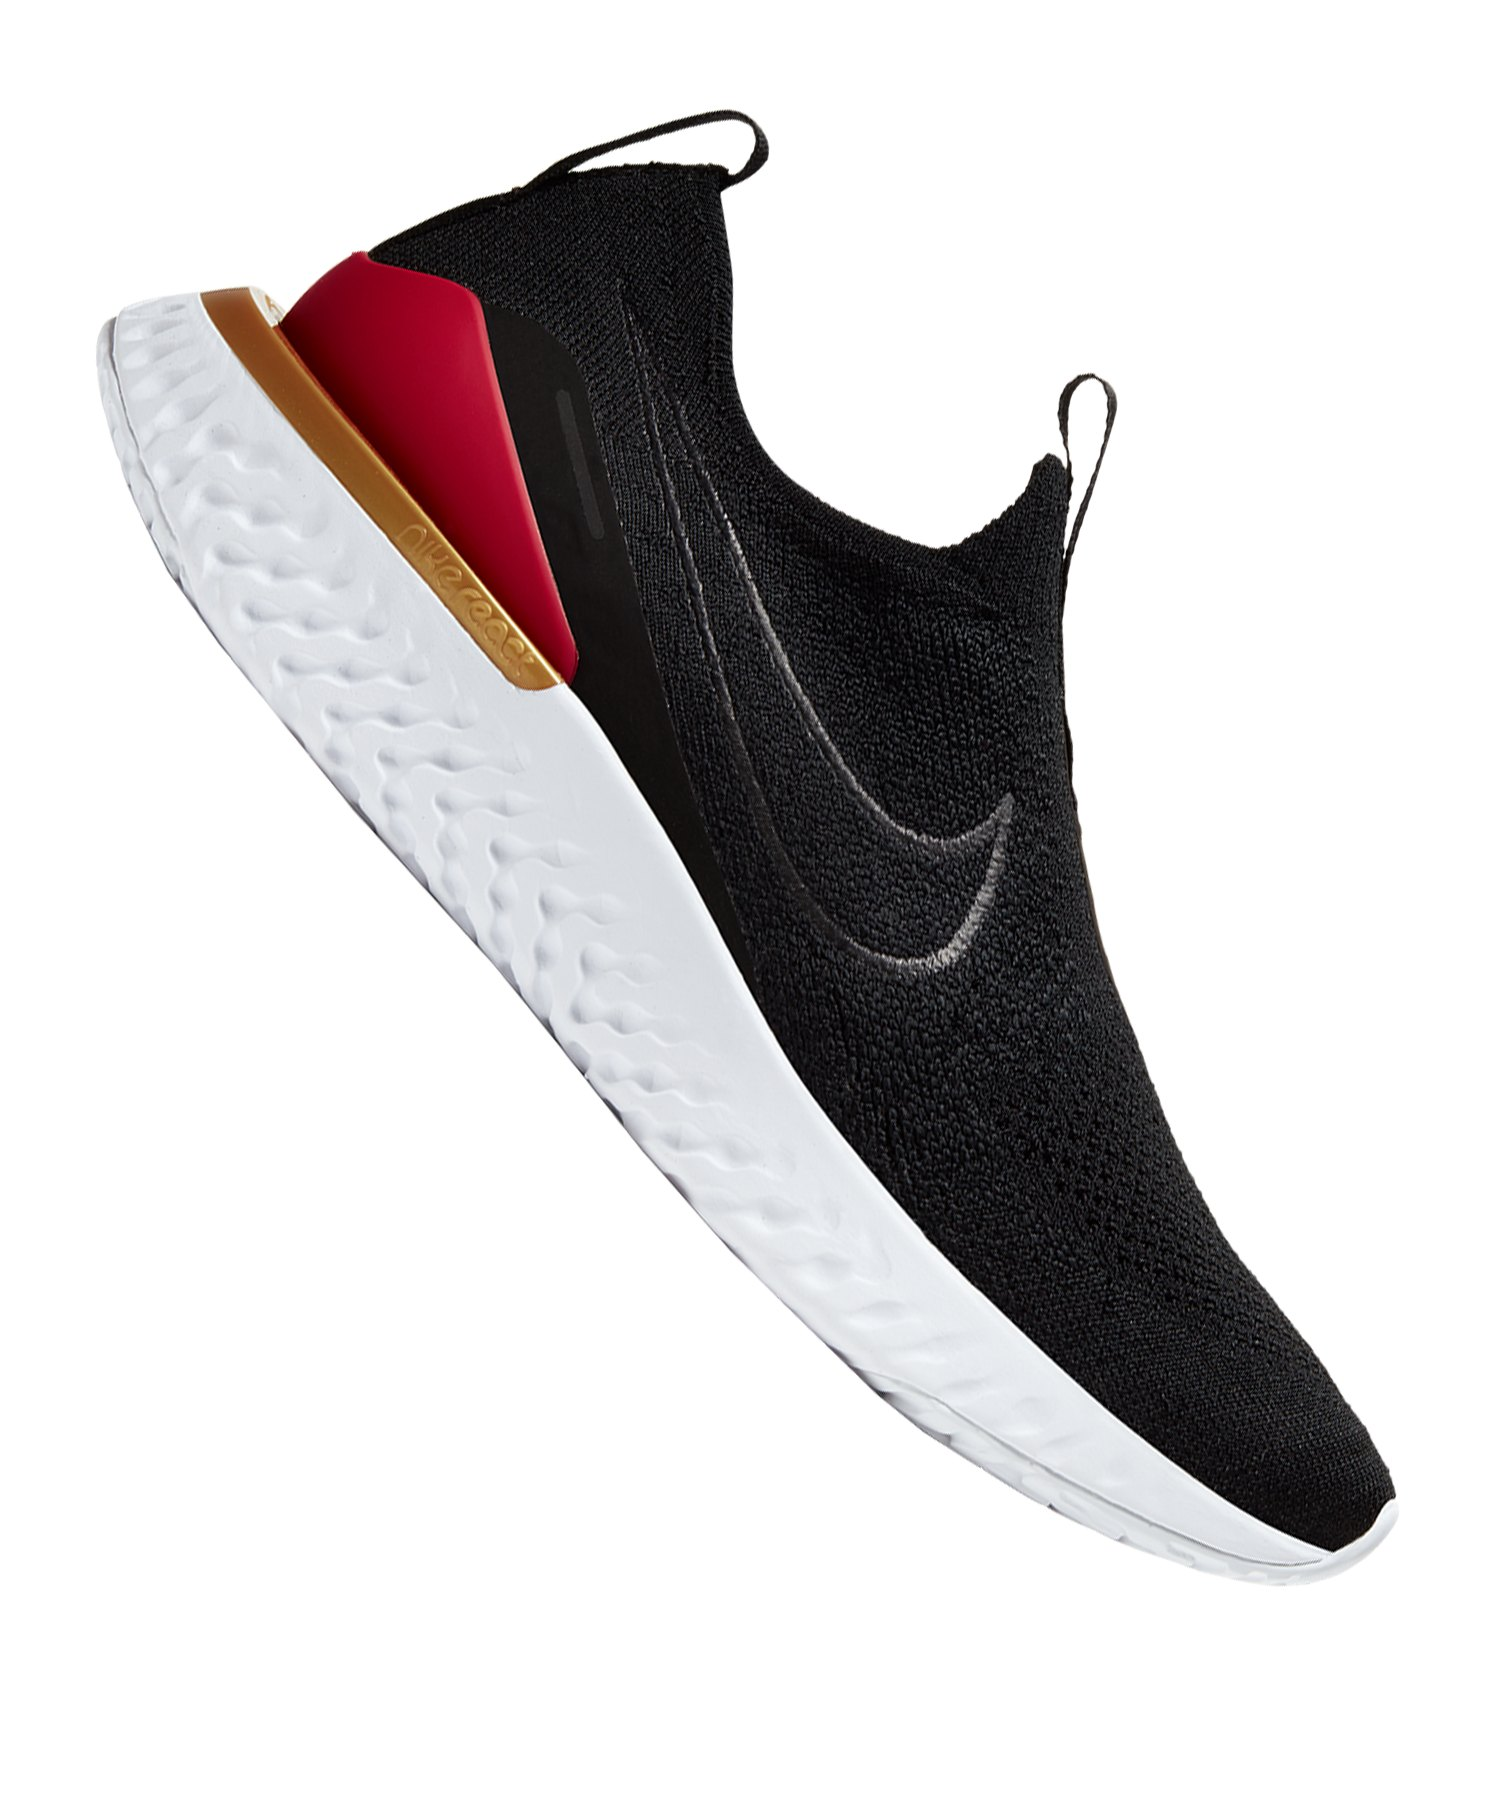 Nike Epic Phantom React Flyknit Running Damen F004 - schwarz